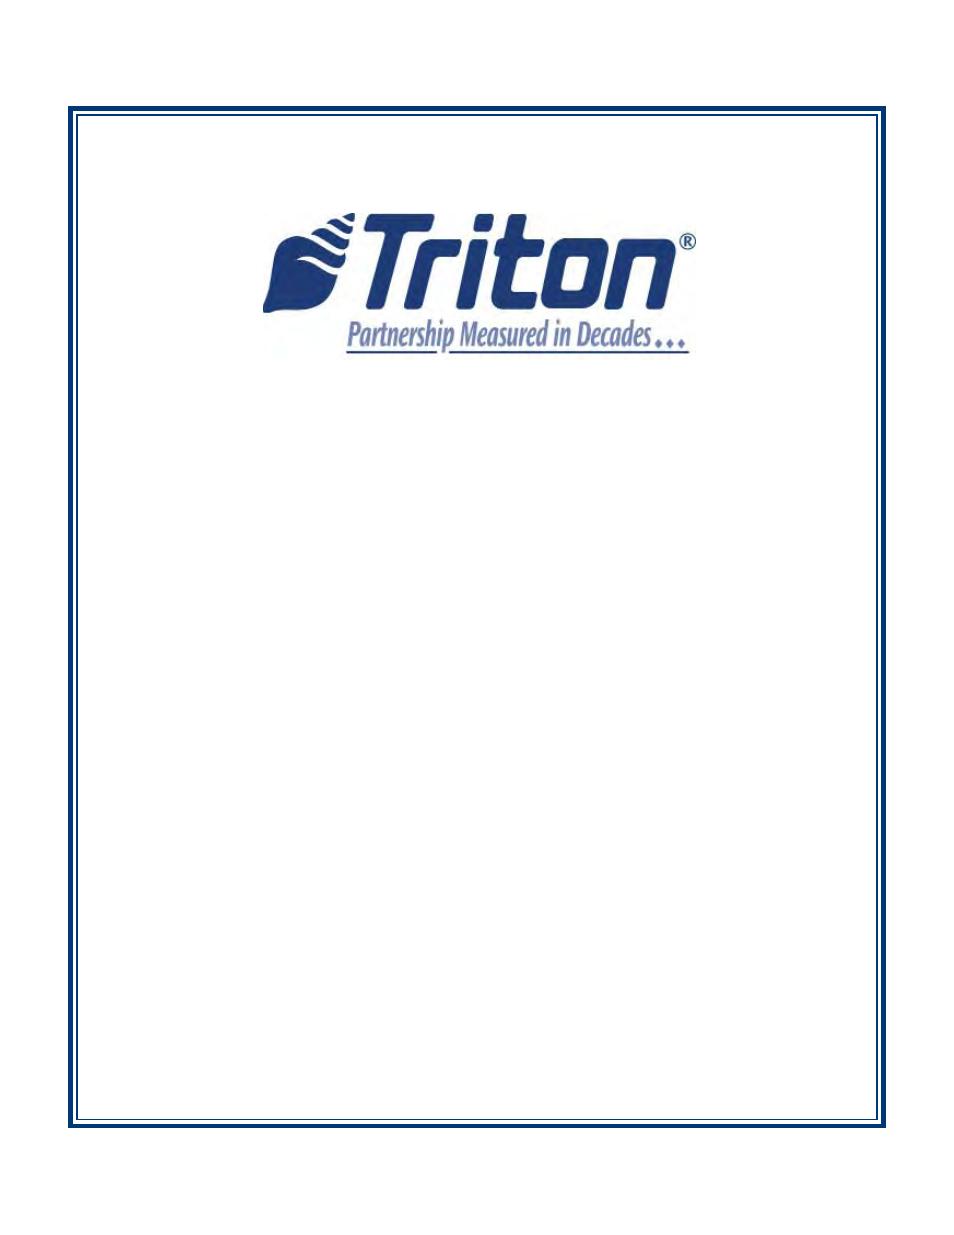 Triton rl5000 x2 series user manual user manual 122 pages publicscrutiny Choice Image